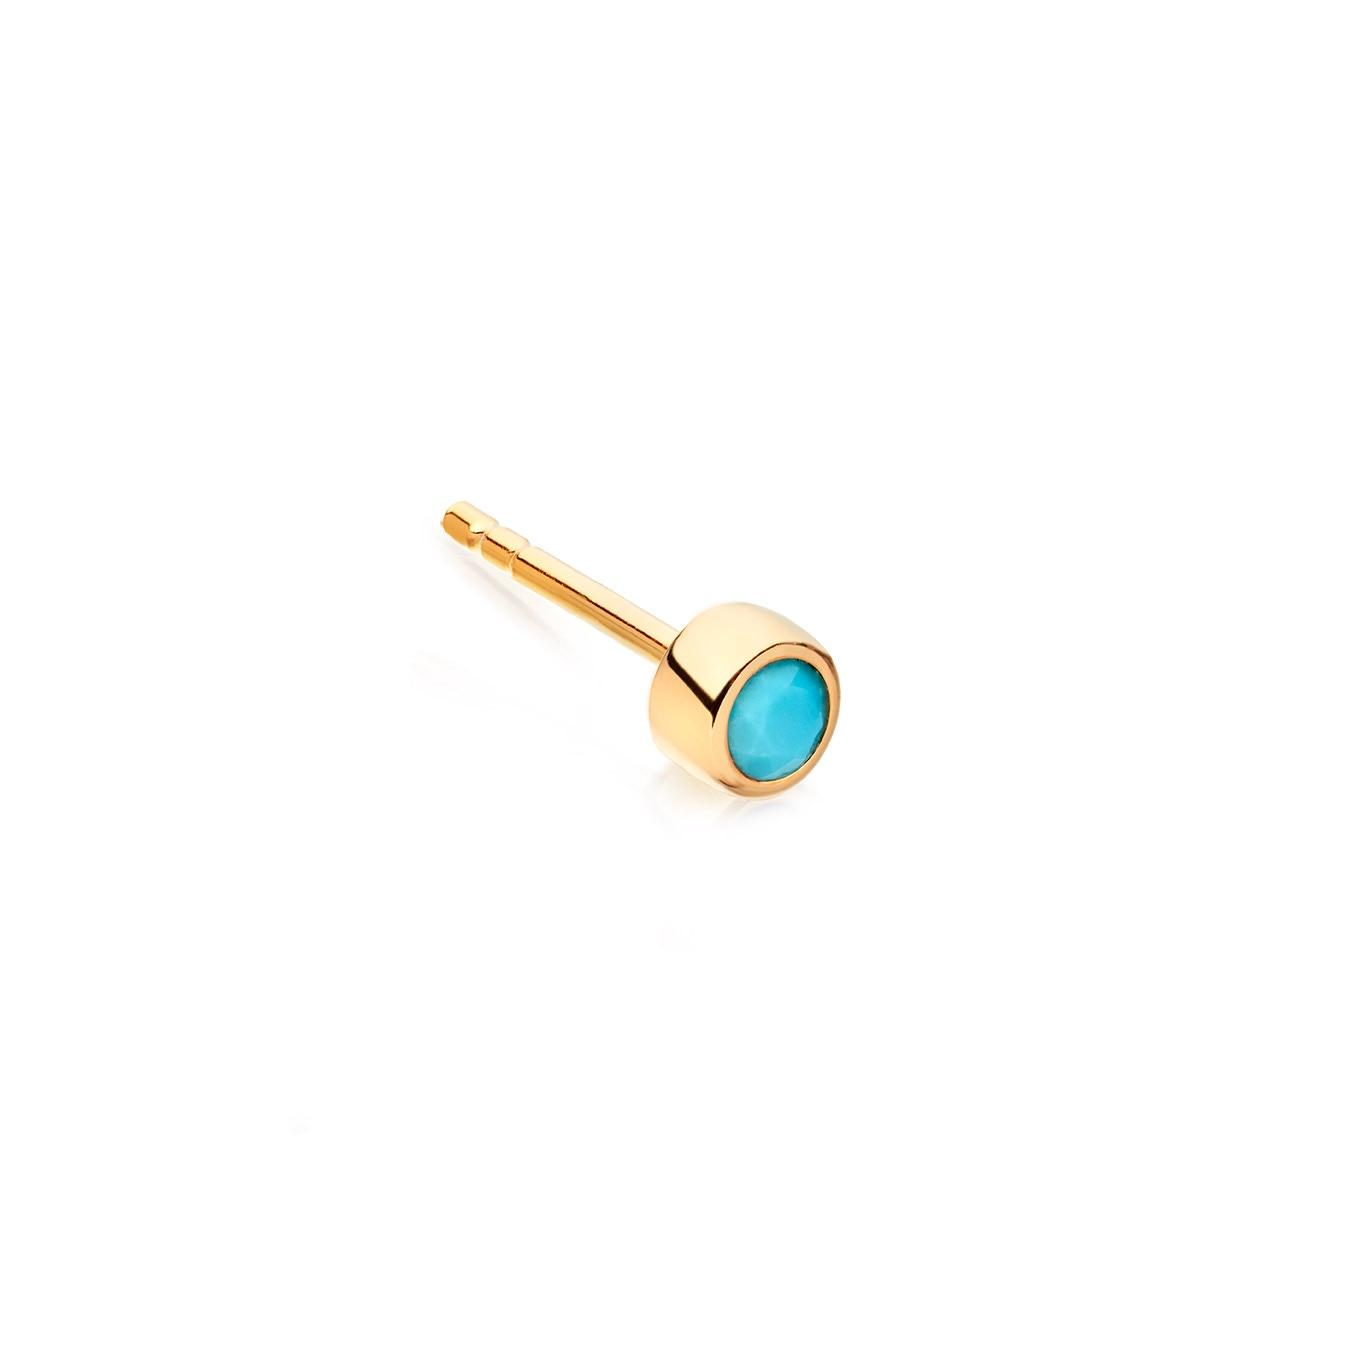 Mini Turquoise Single Stilla Stud Earring